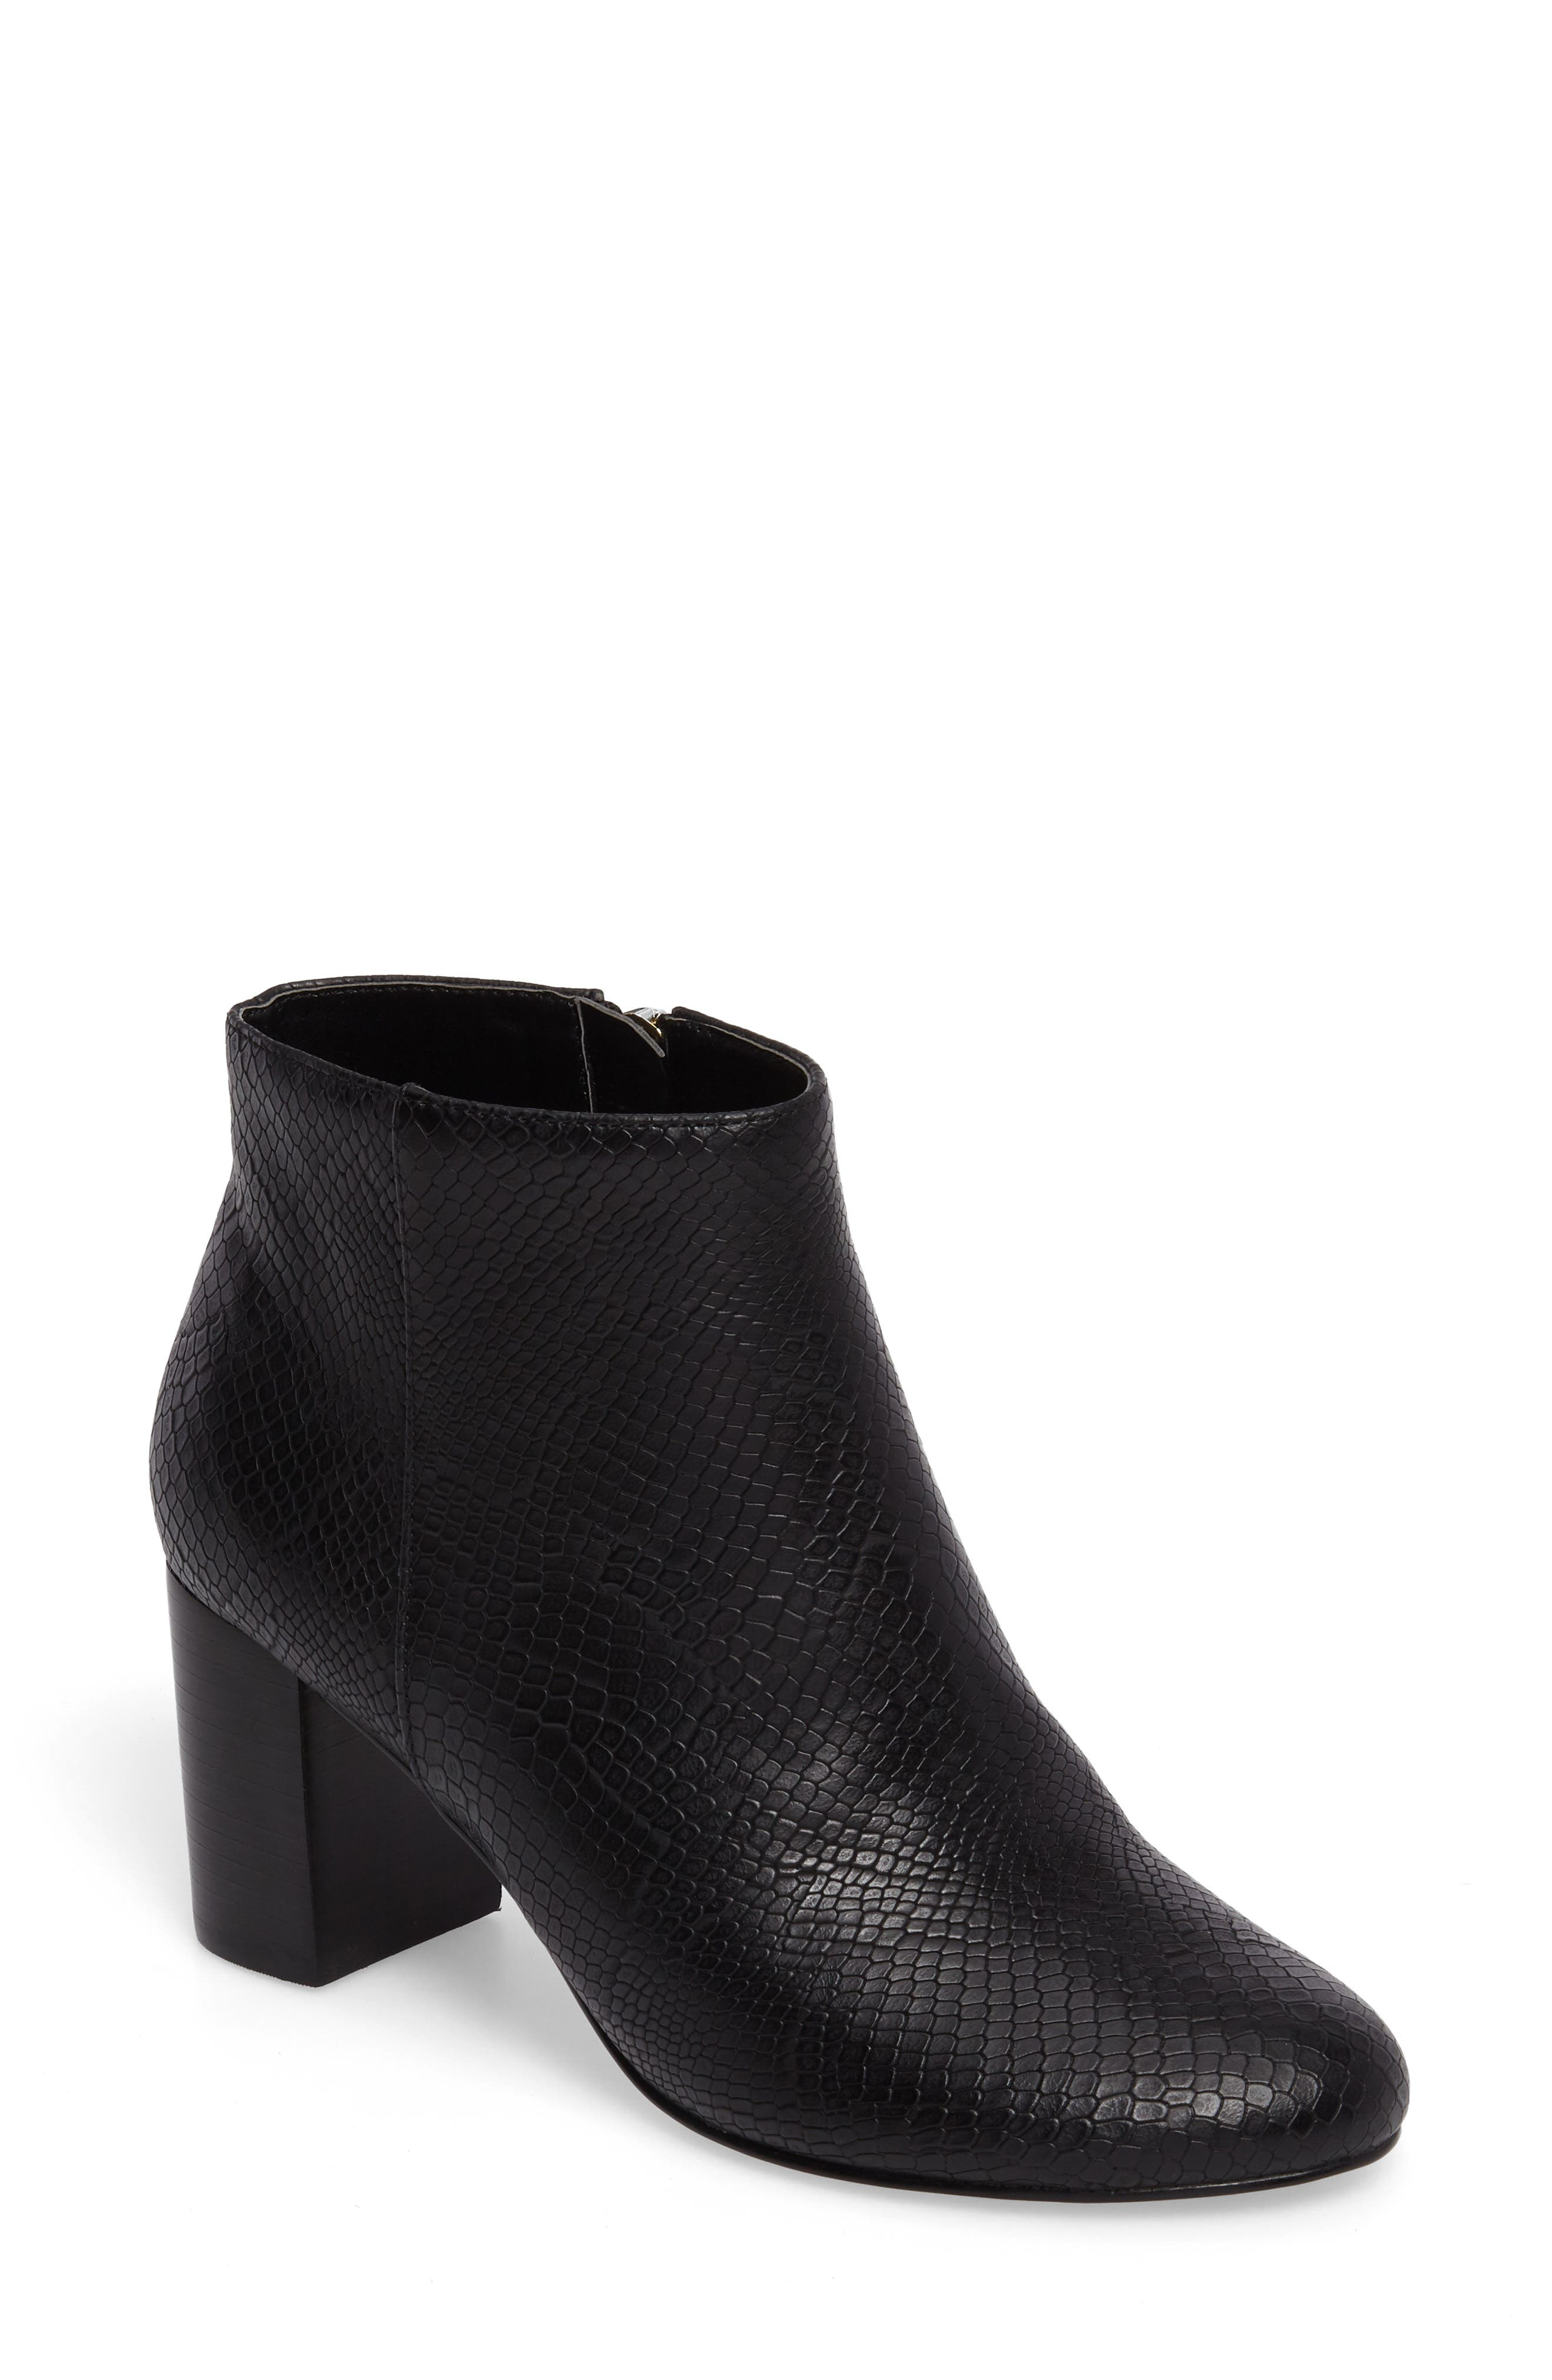 Klaudia II Block Heel Bootie,                         Main,                         color, Black Printed Leather